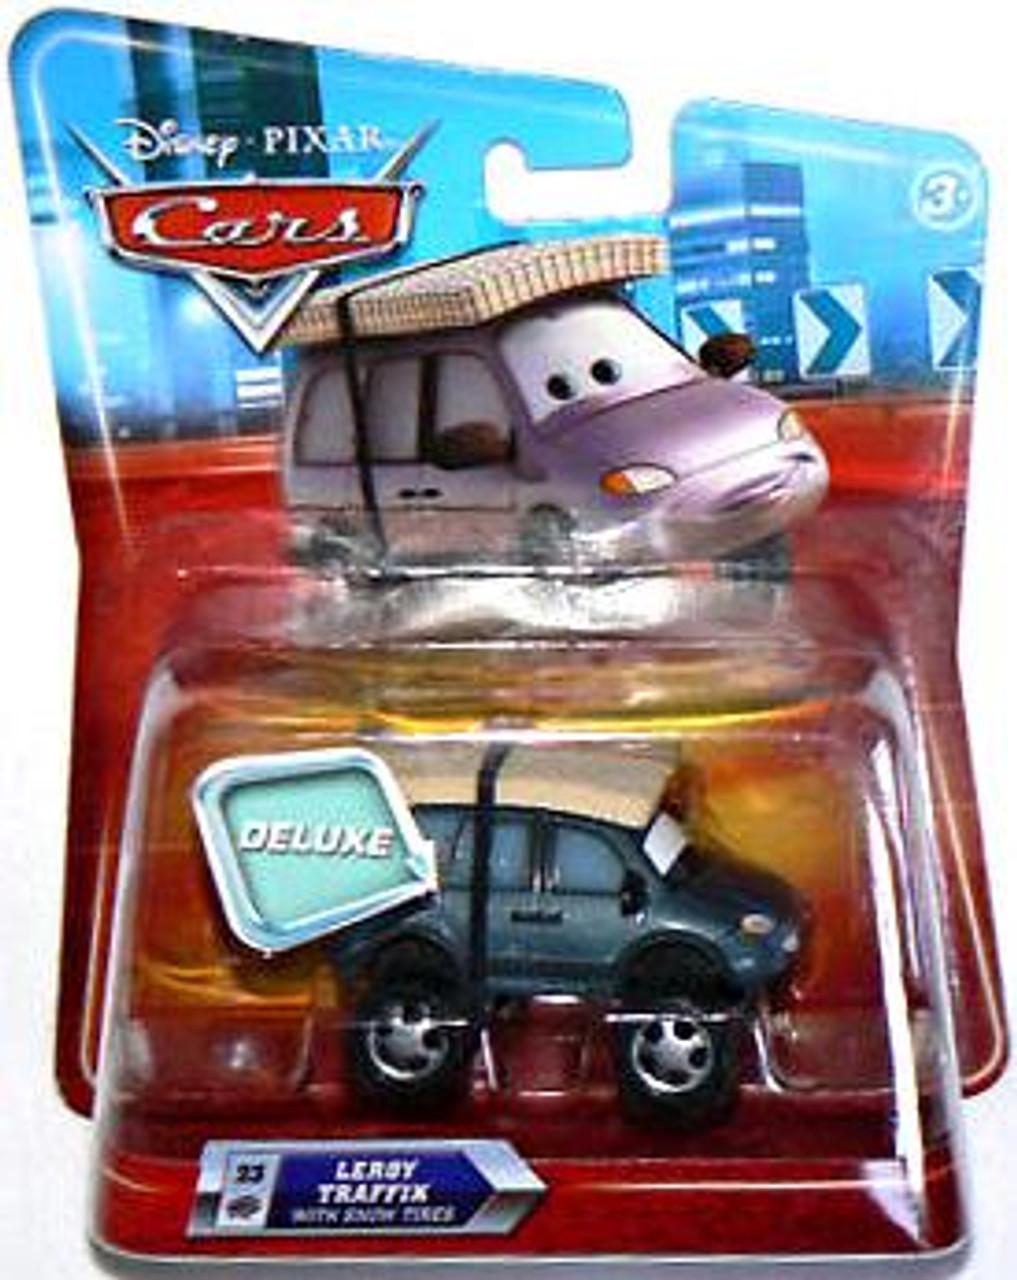 Disney Cars Deluxe Oversized Leroy Traffik Diecast Car [Snow Tires]